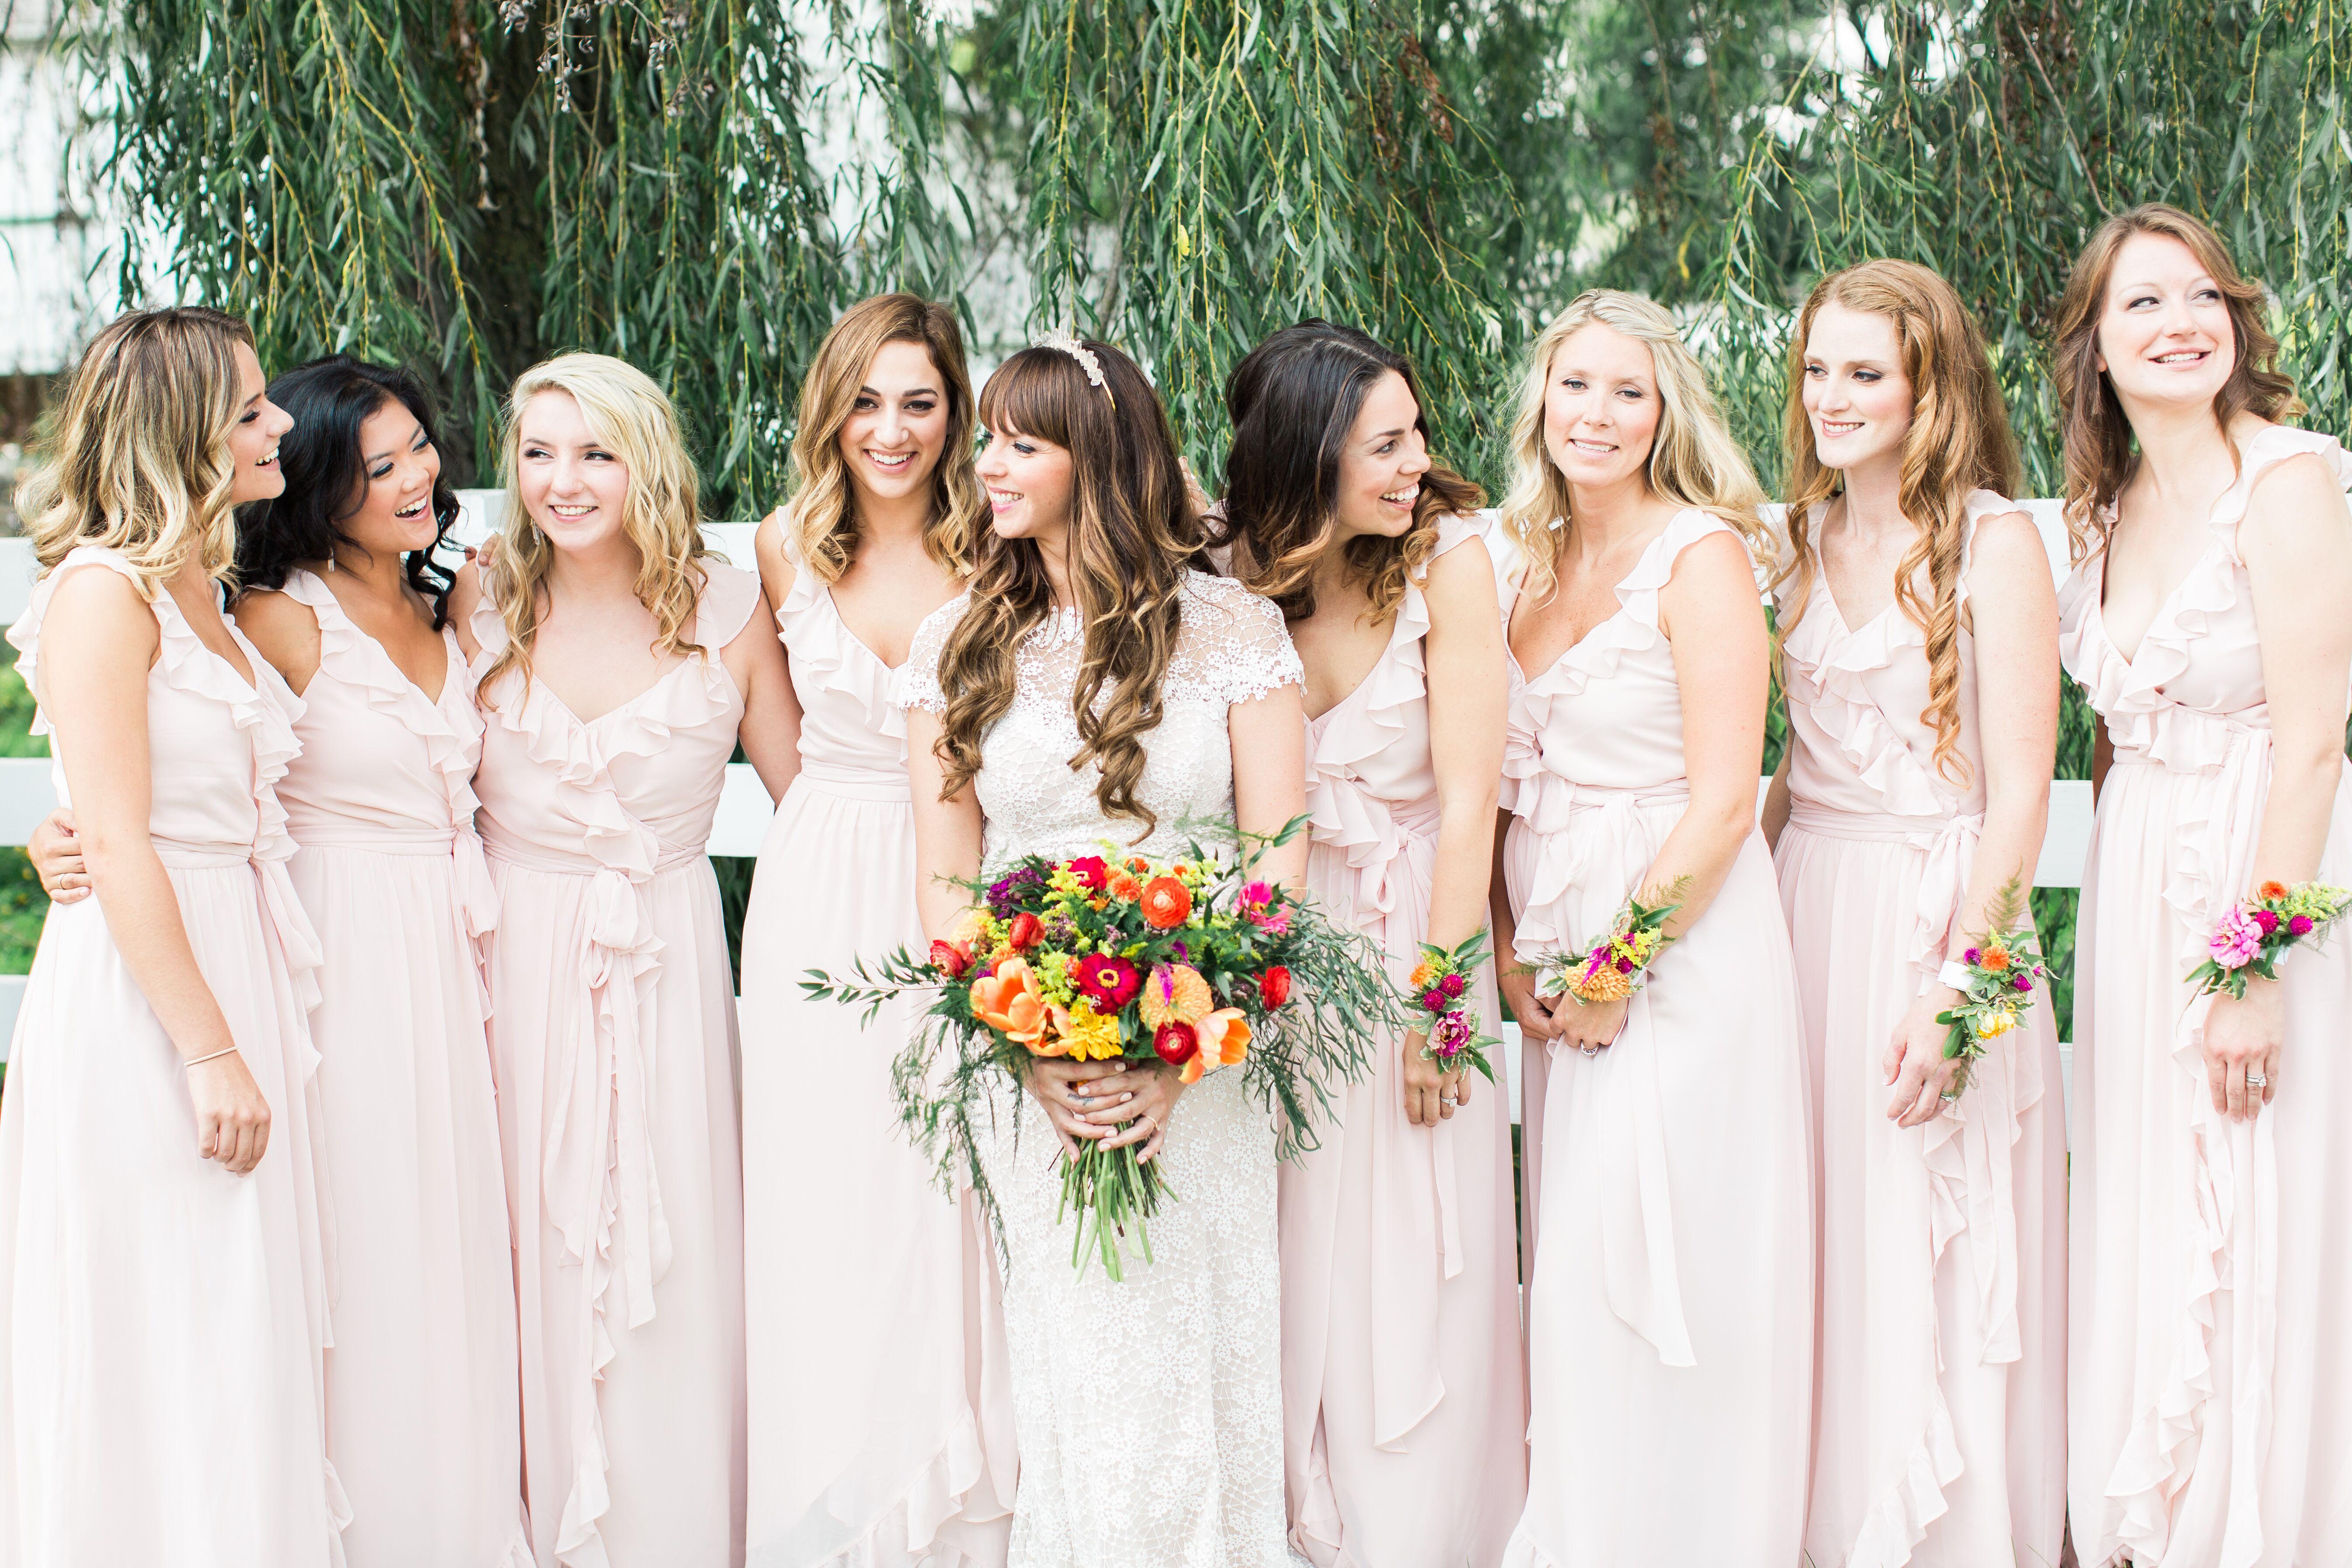 Bohemian bridesmaid dresses joanna august polly blush bridesmaid dress ombrellifo Gallery